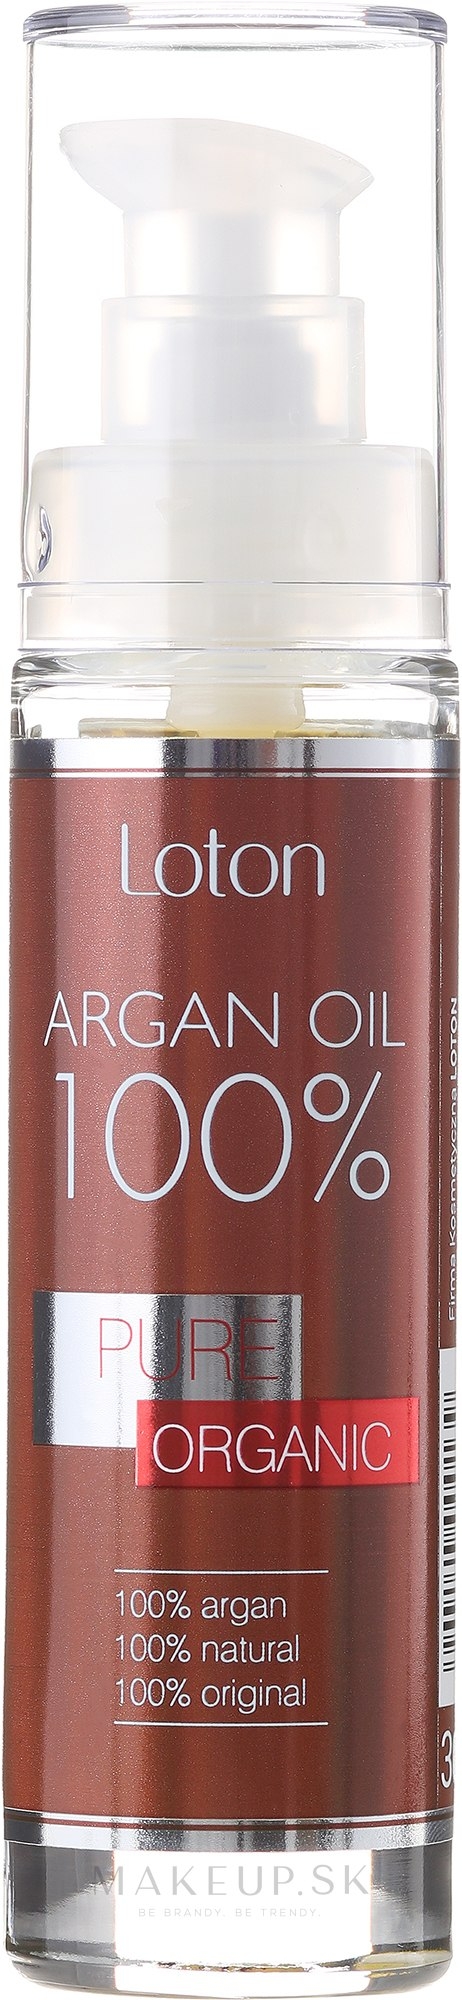 Arganový oléj - Loton Argan Oil 100% — Obrázky 30 ml